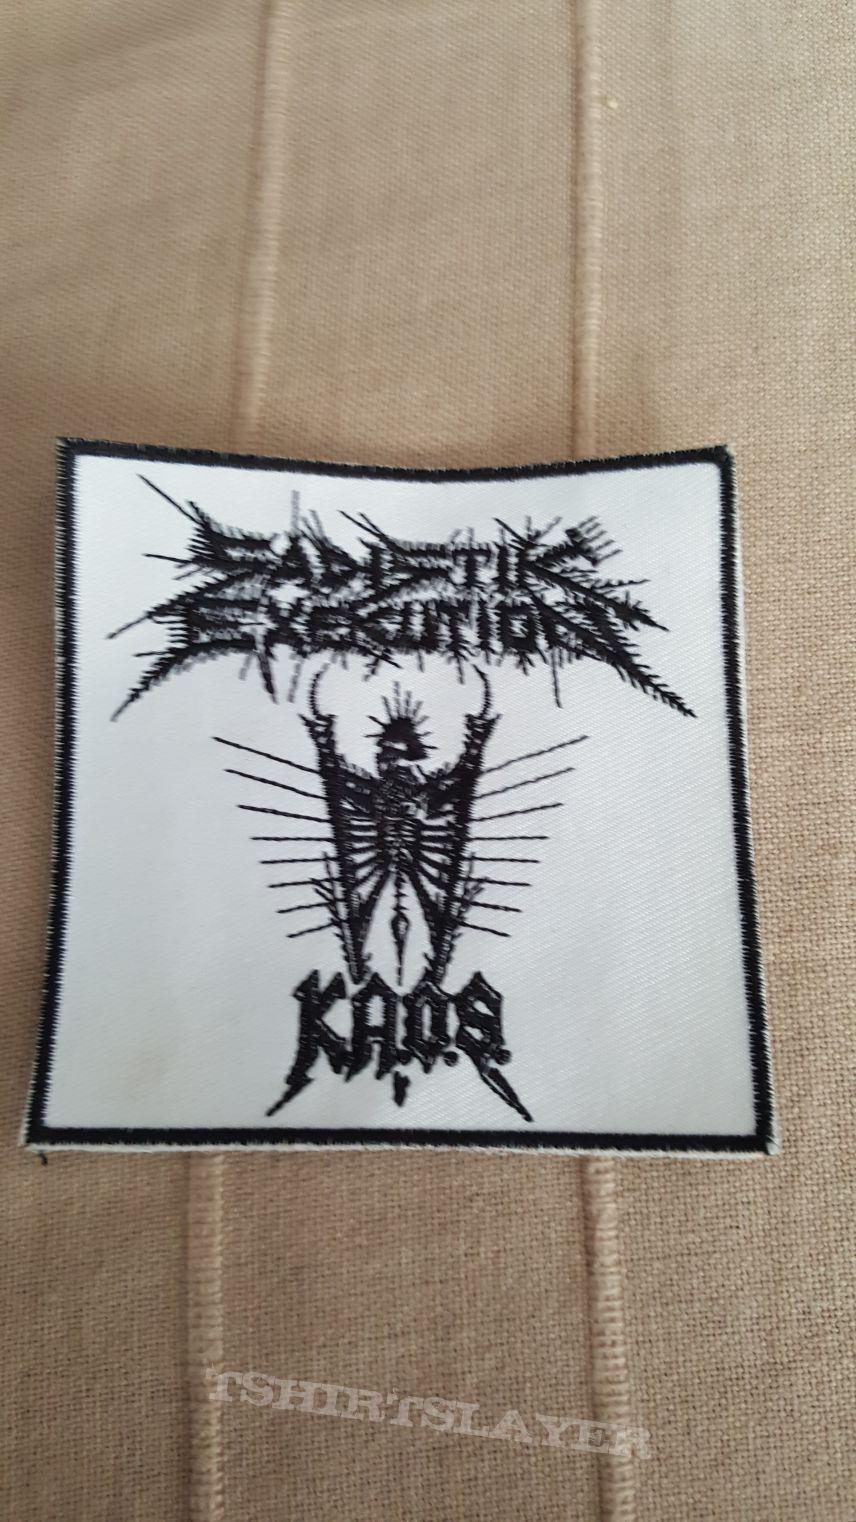 Sadistik Exekution - K.A.O.S. Patch